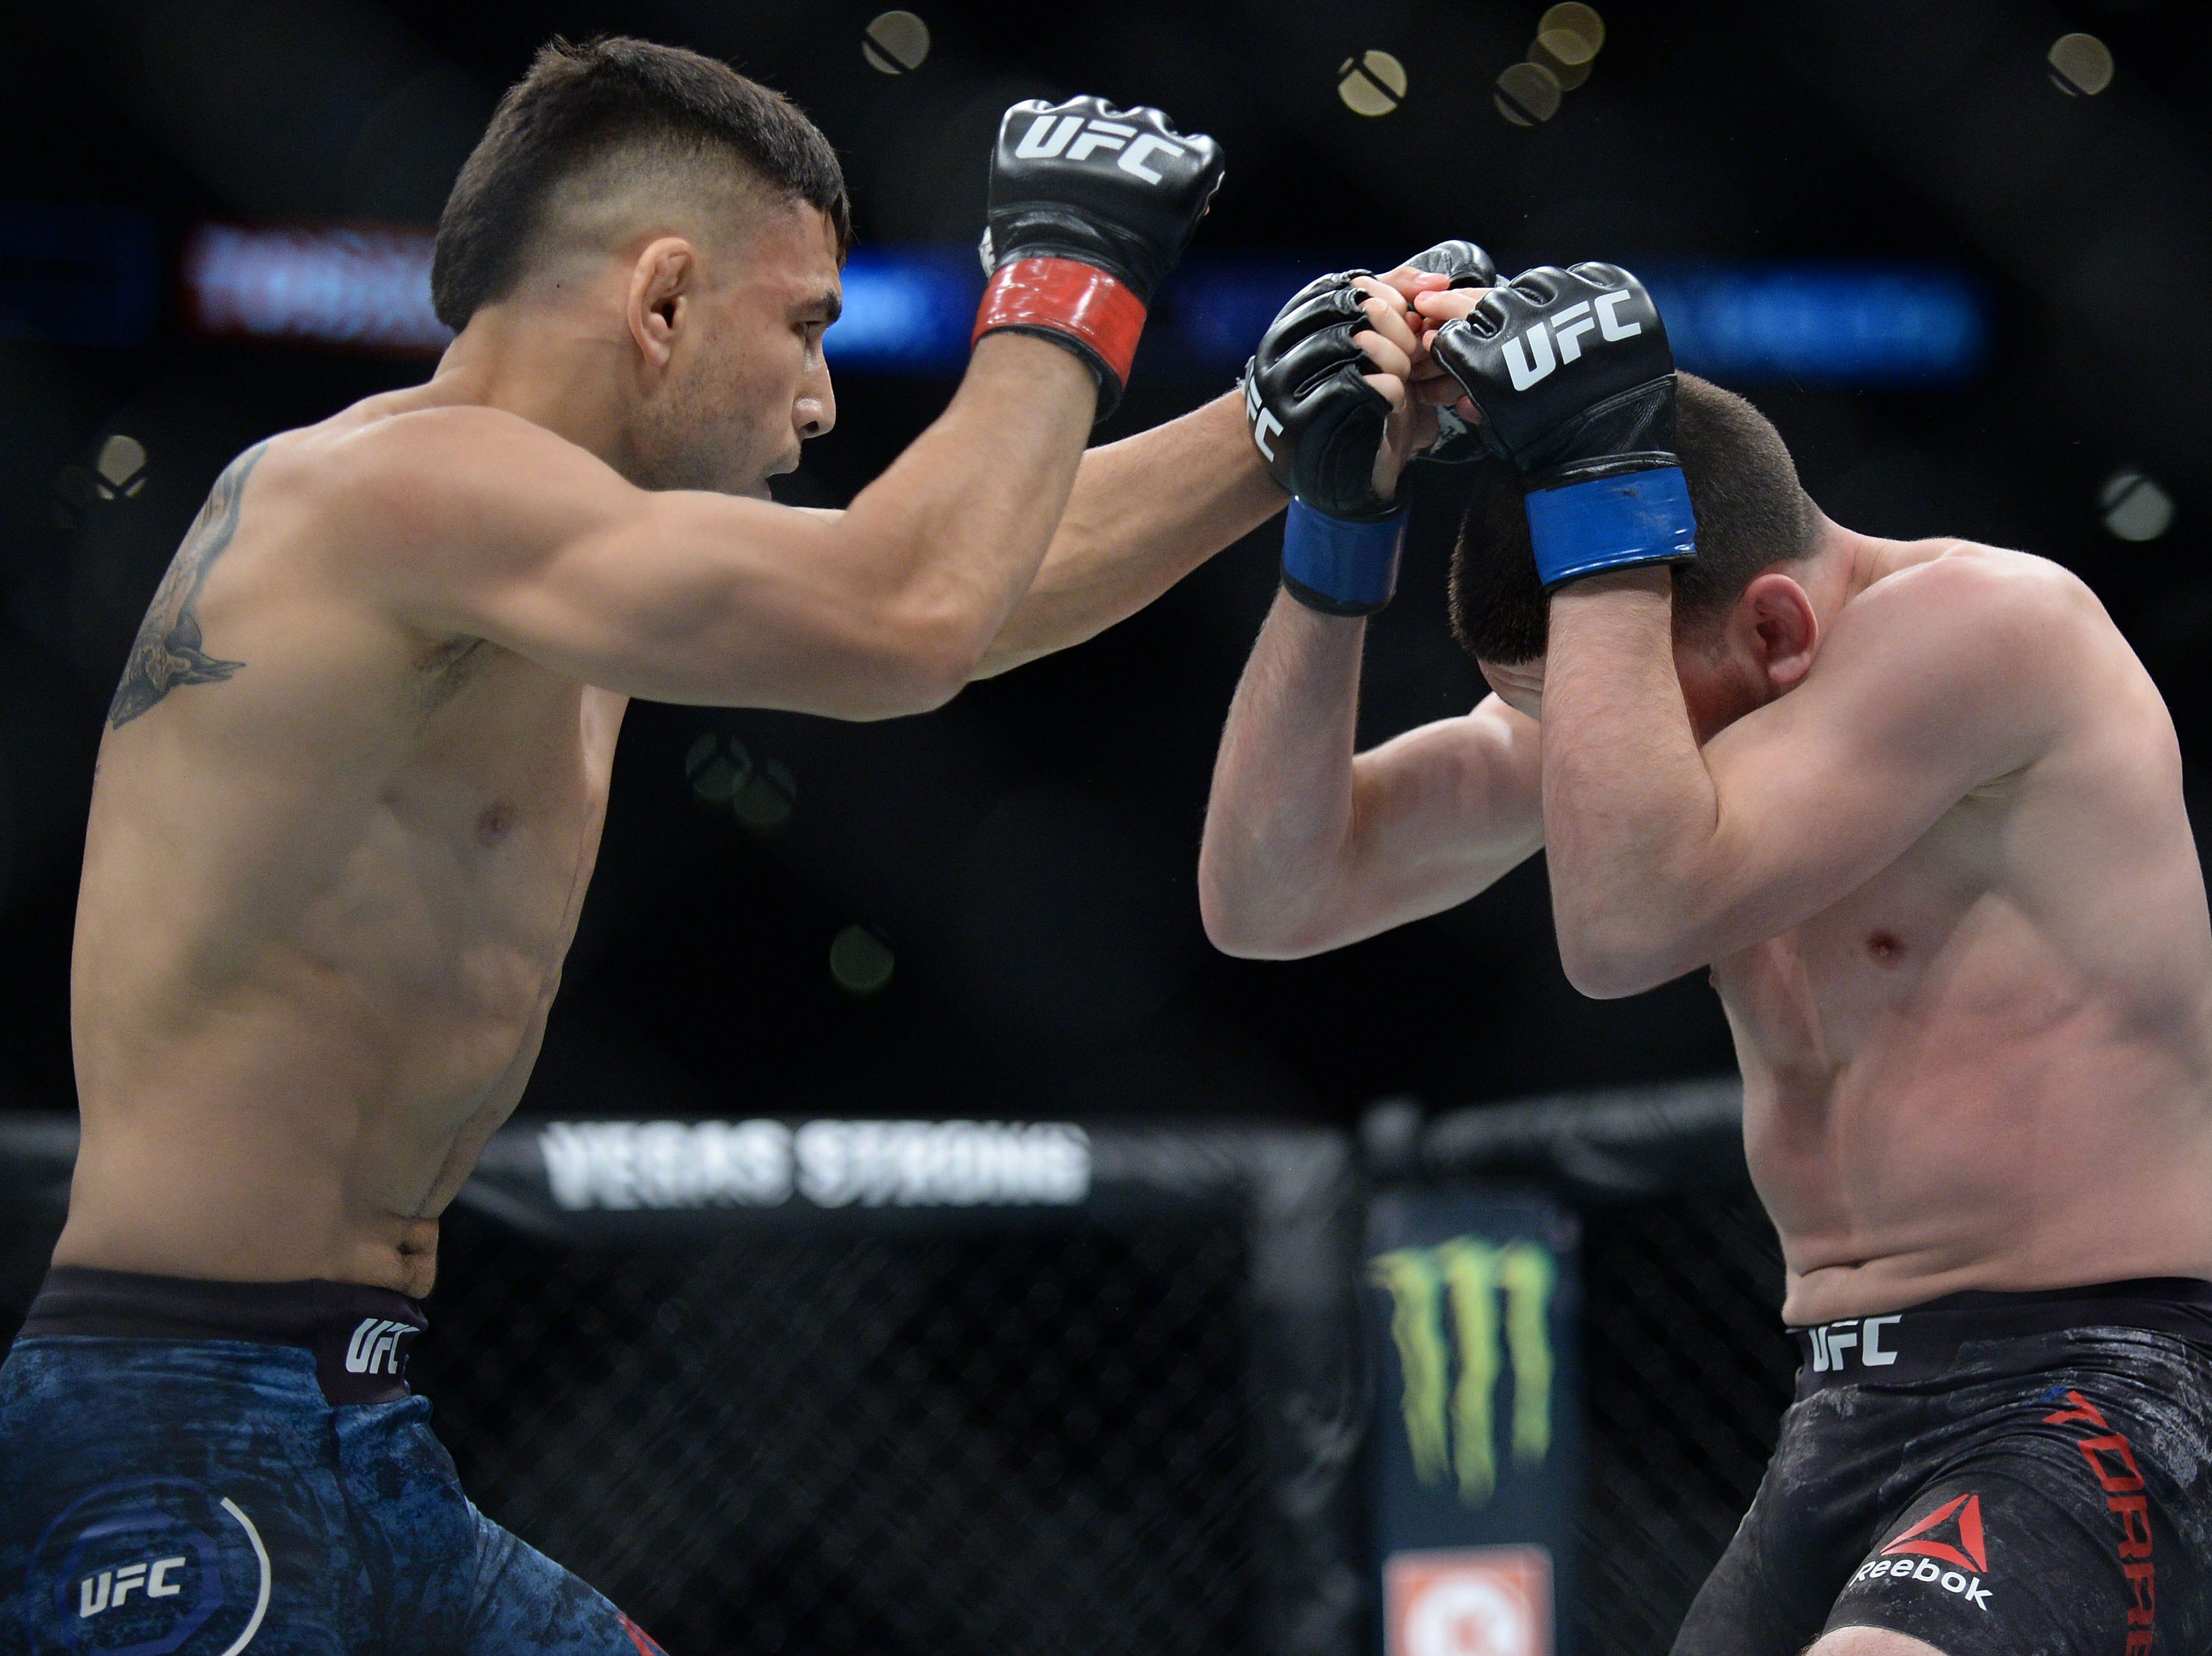 Alex Perez moves in against Jose Torres during UFC 227 at Staples Center.